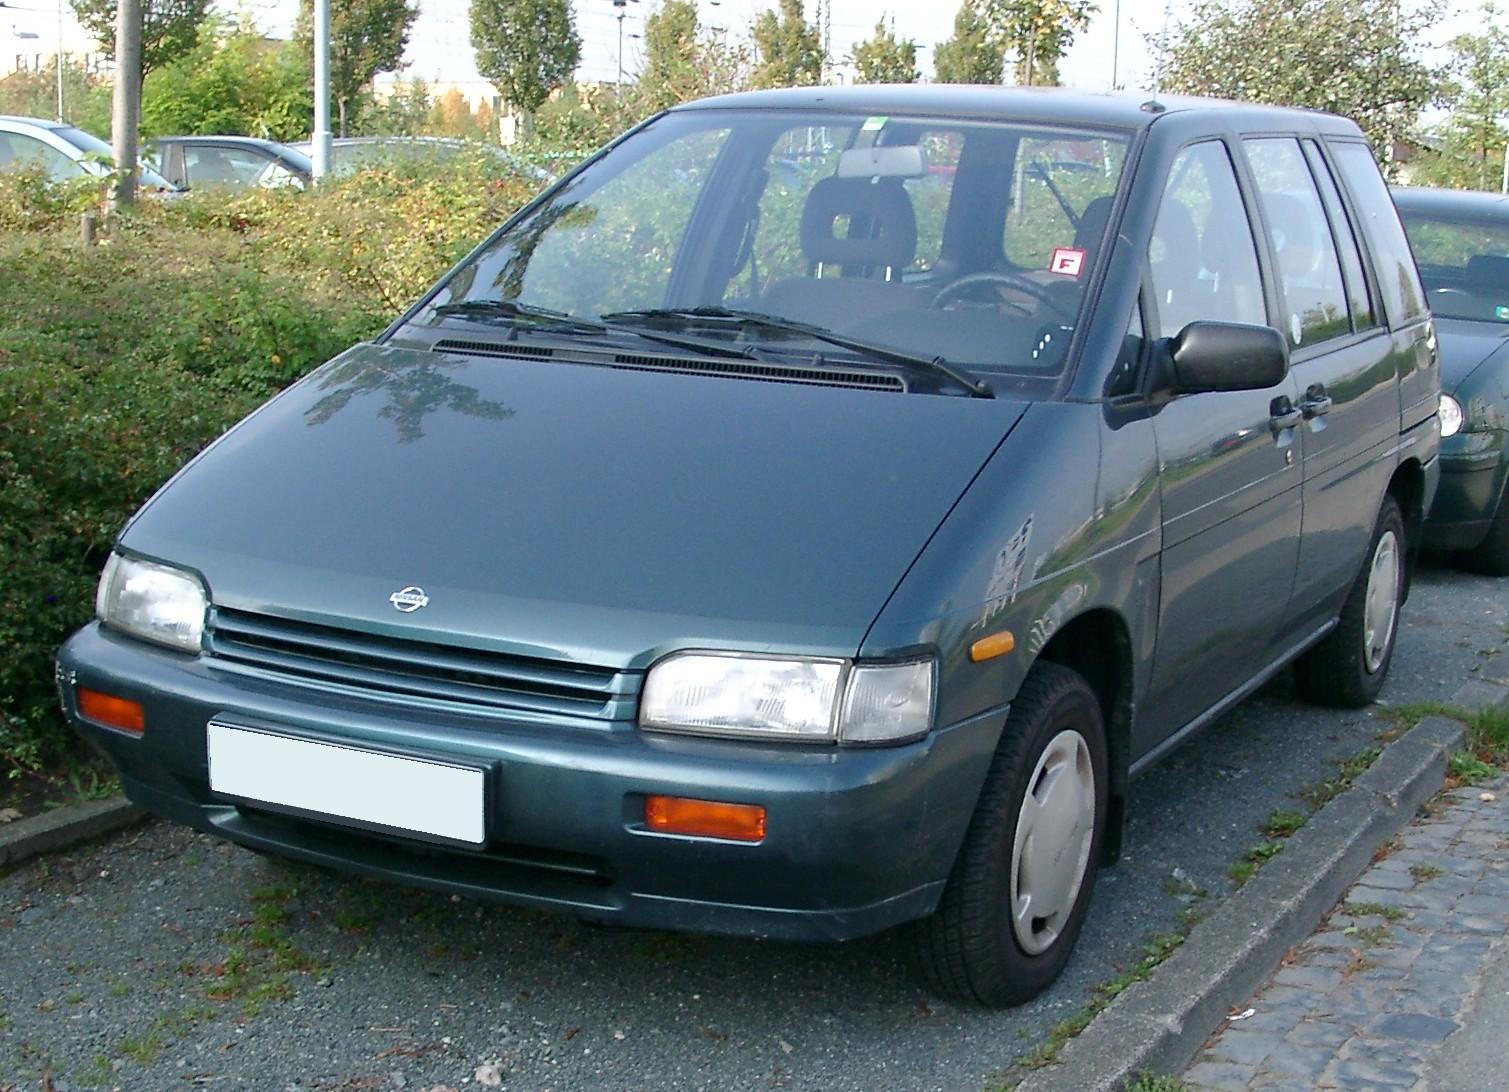 File:Nissan Prairie front 20071004.jpg